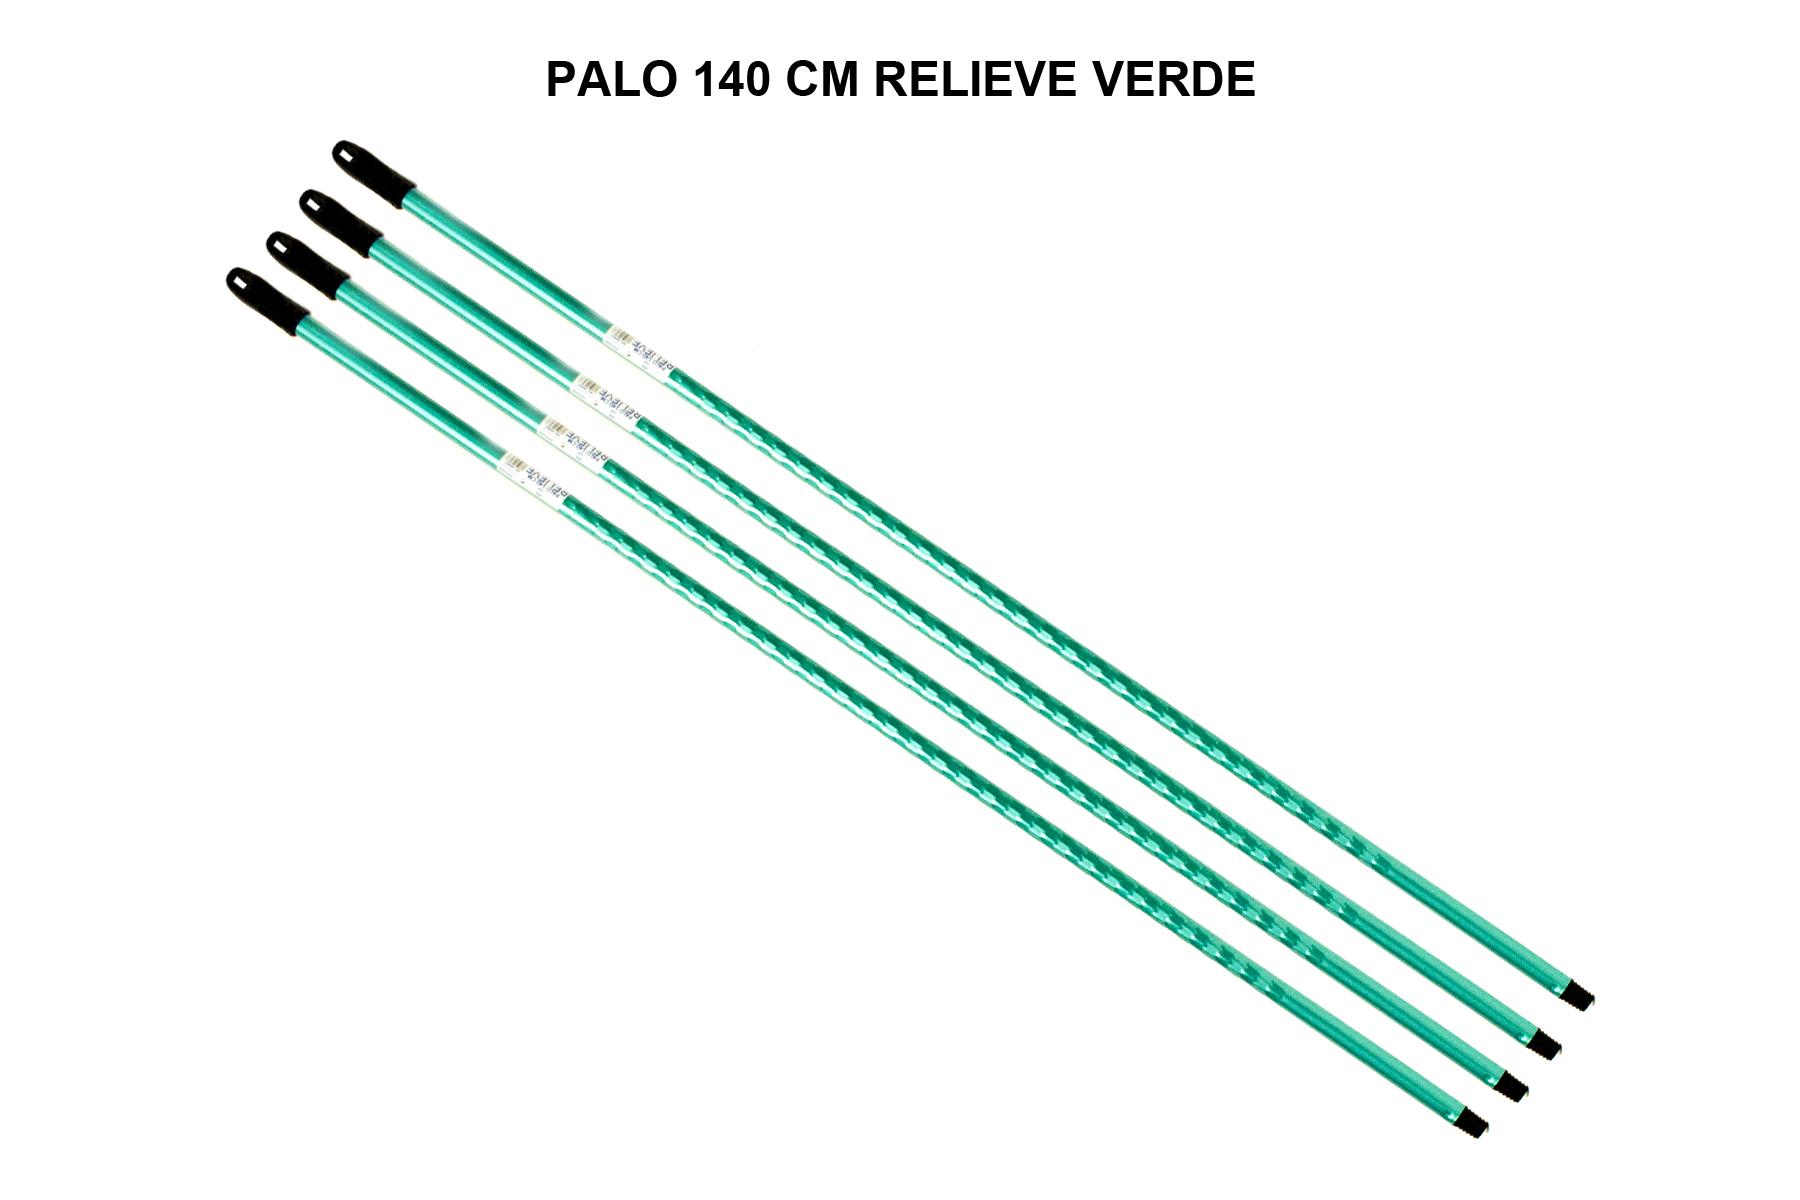 PALO 140 CM RELIEVE VERDE